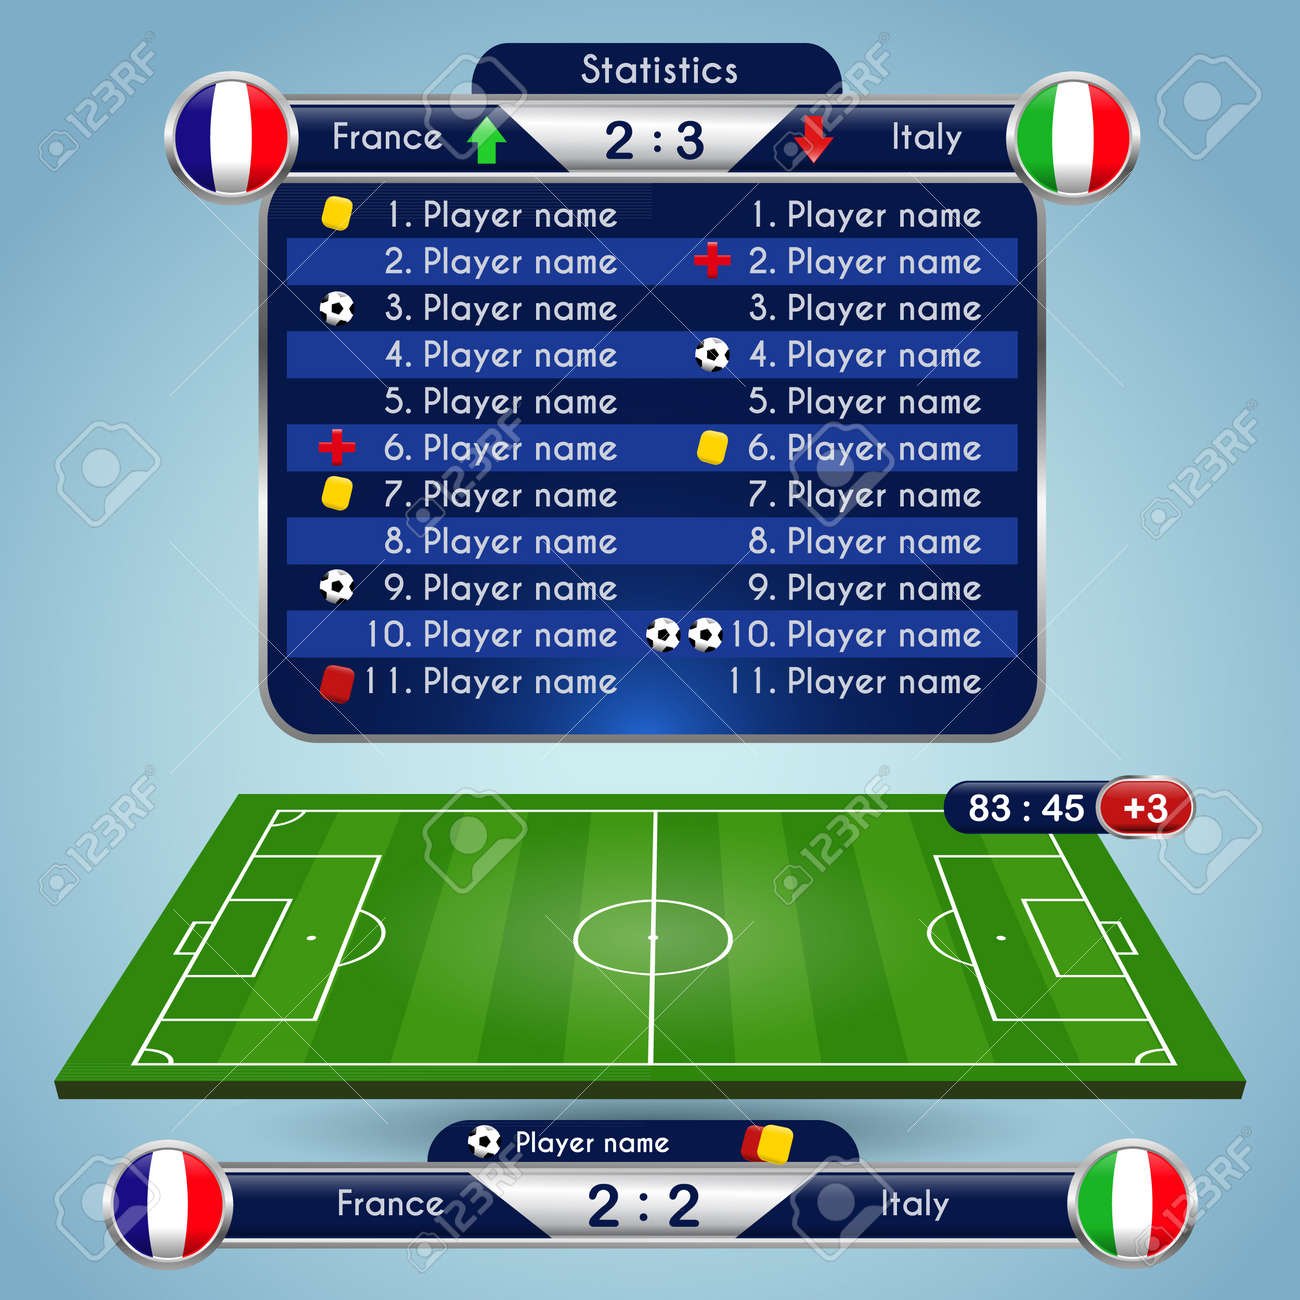 Broadcast Graphics for Sport Program  Football Soccer Match Statistics